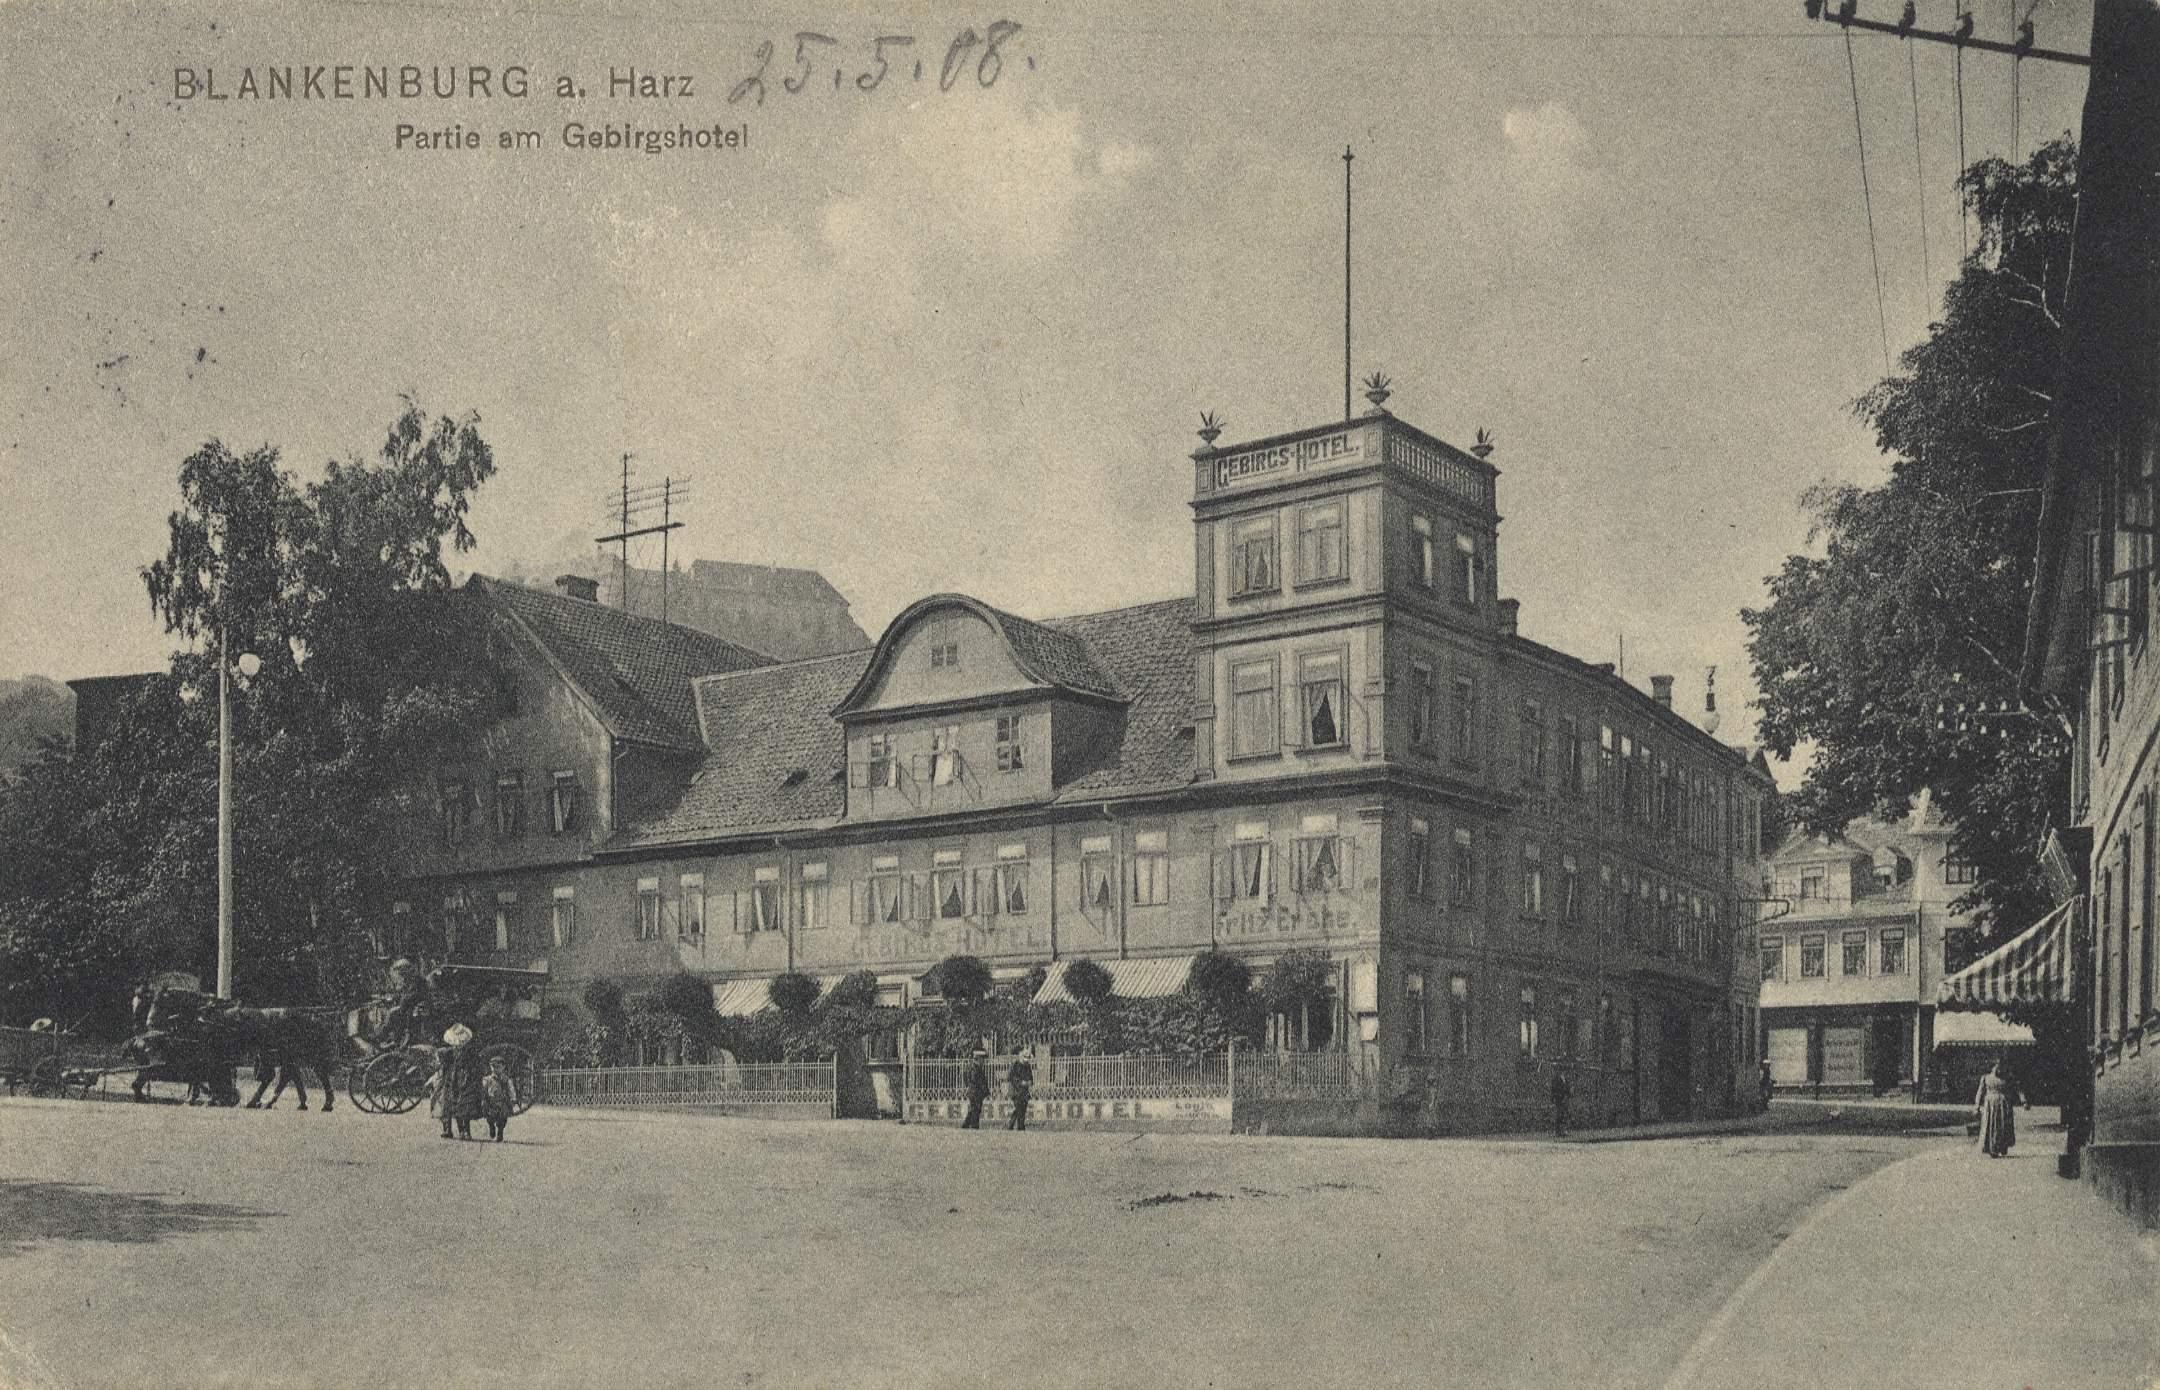 blankenburg singles Greifswald